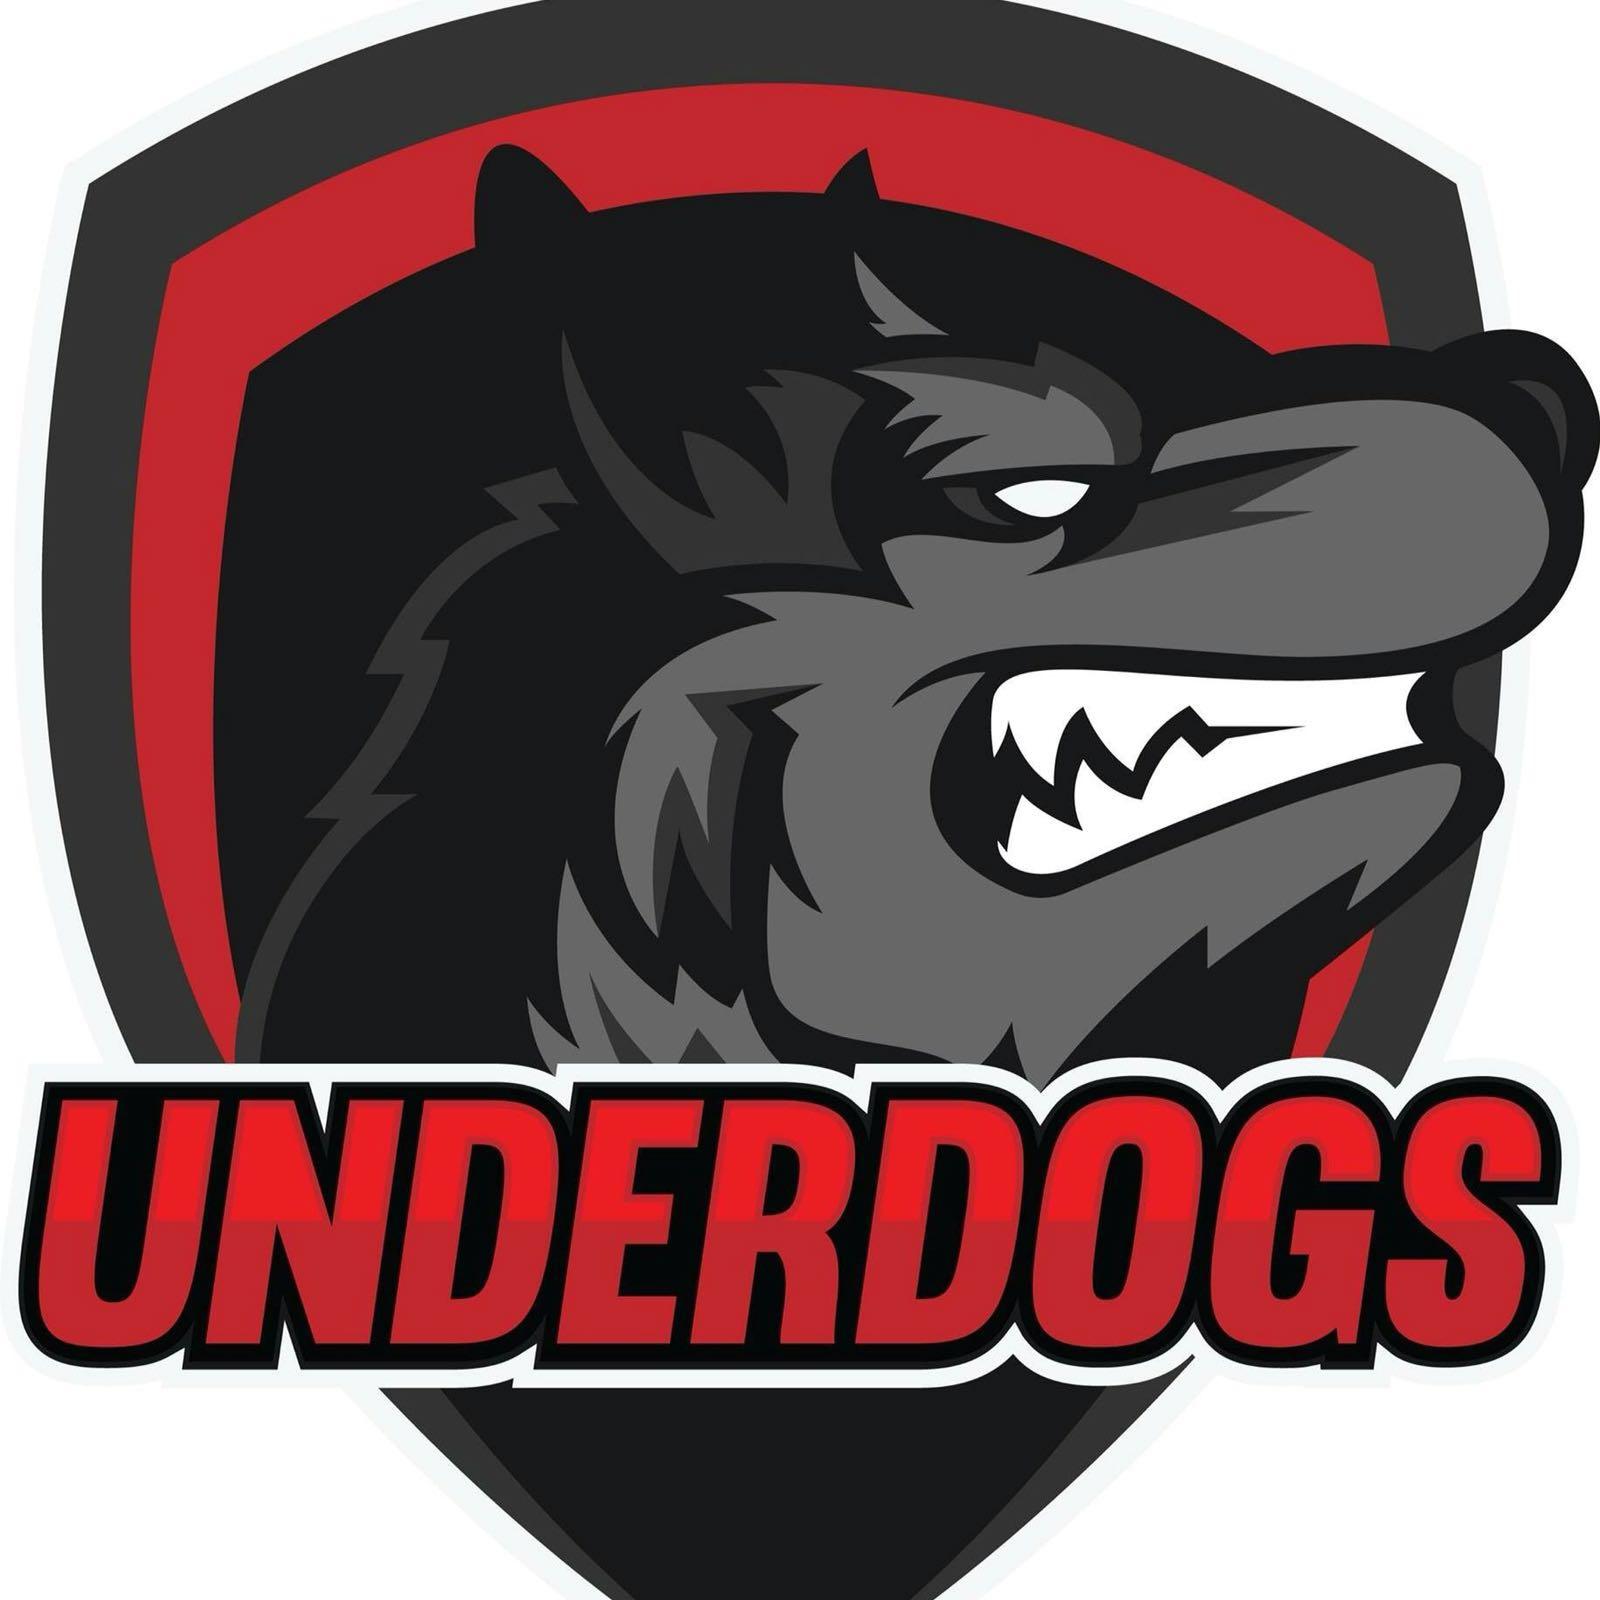 Underdogs Cricket Club